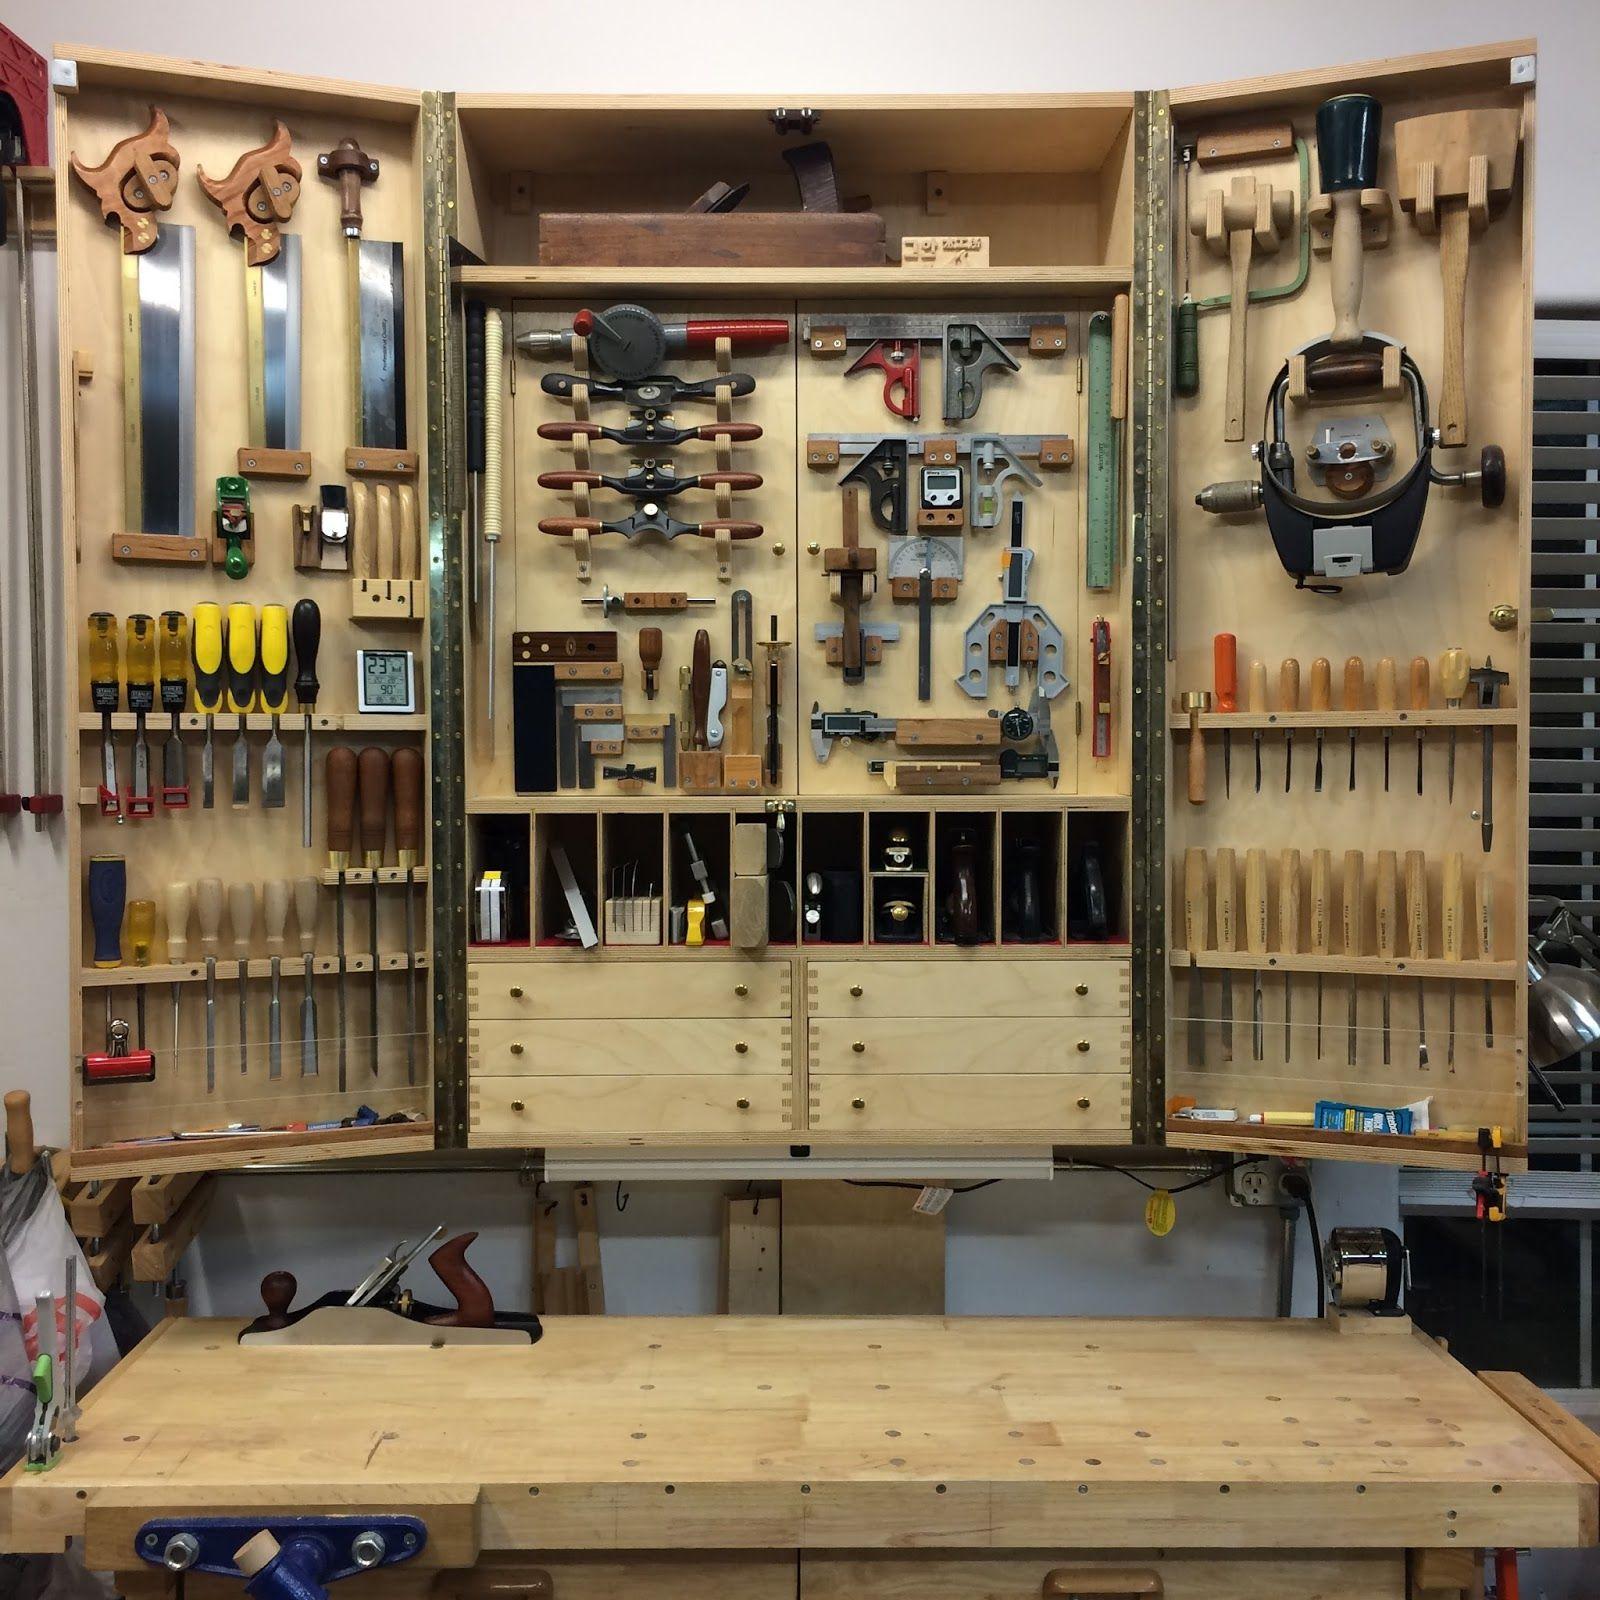 Img 1531 Jpg 1600 1600 Rangement Outils Rangement Outil Atelier Rangement Atelier